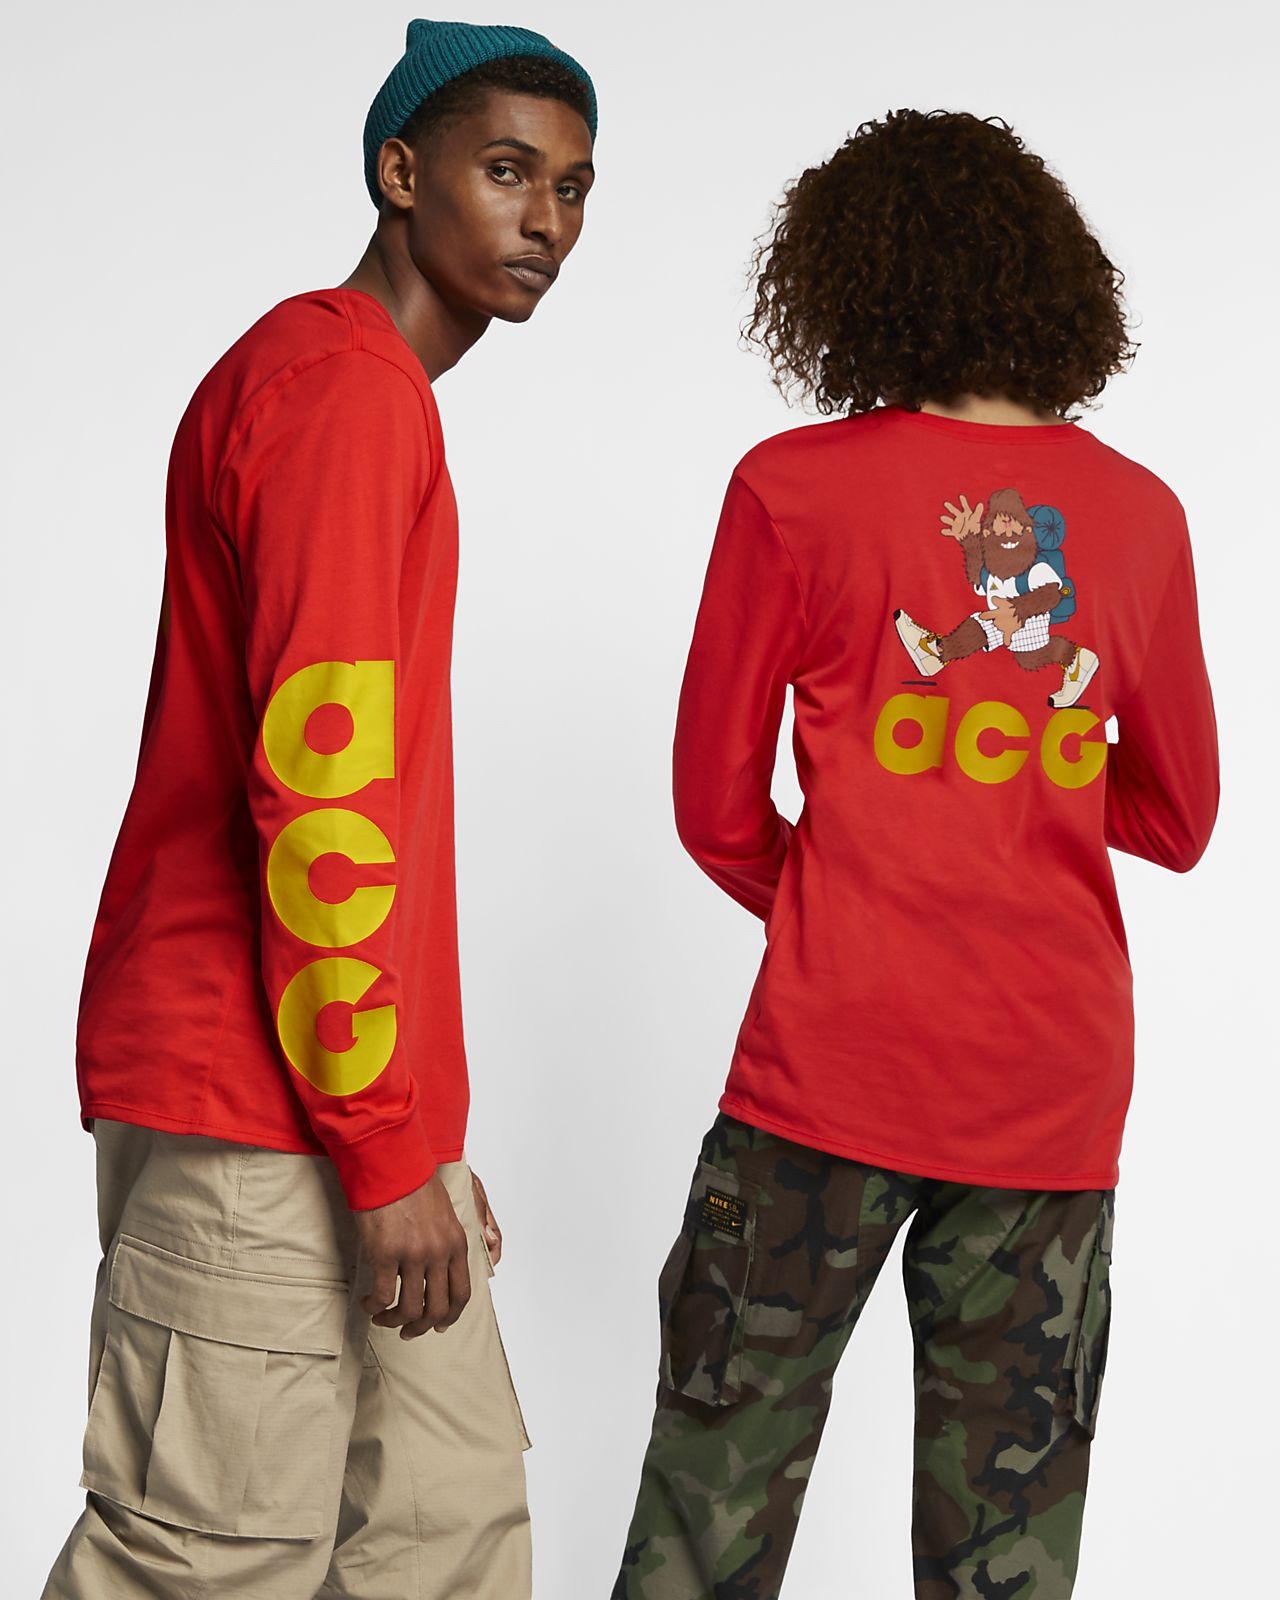 8954a0081c4a8 Nike Sportswear ACG Long-Sleeve T-Shirt. Nike.com